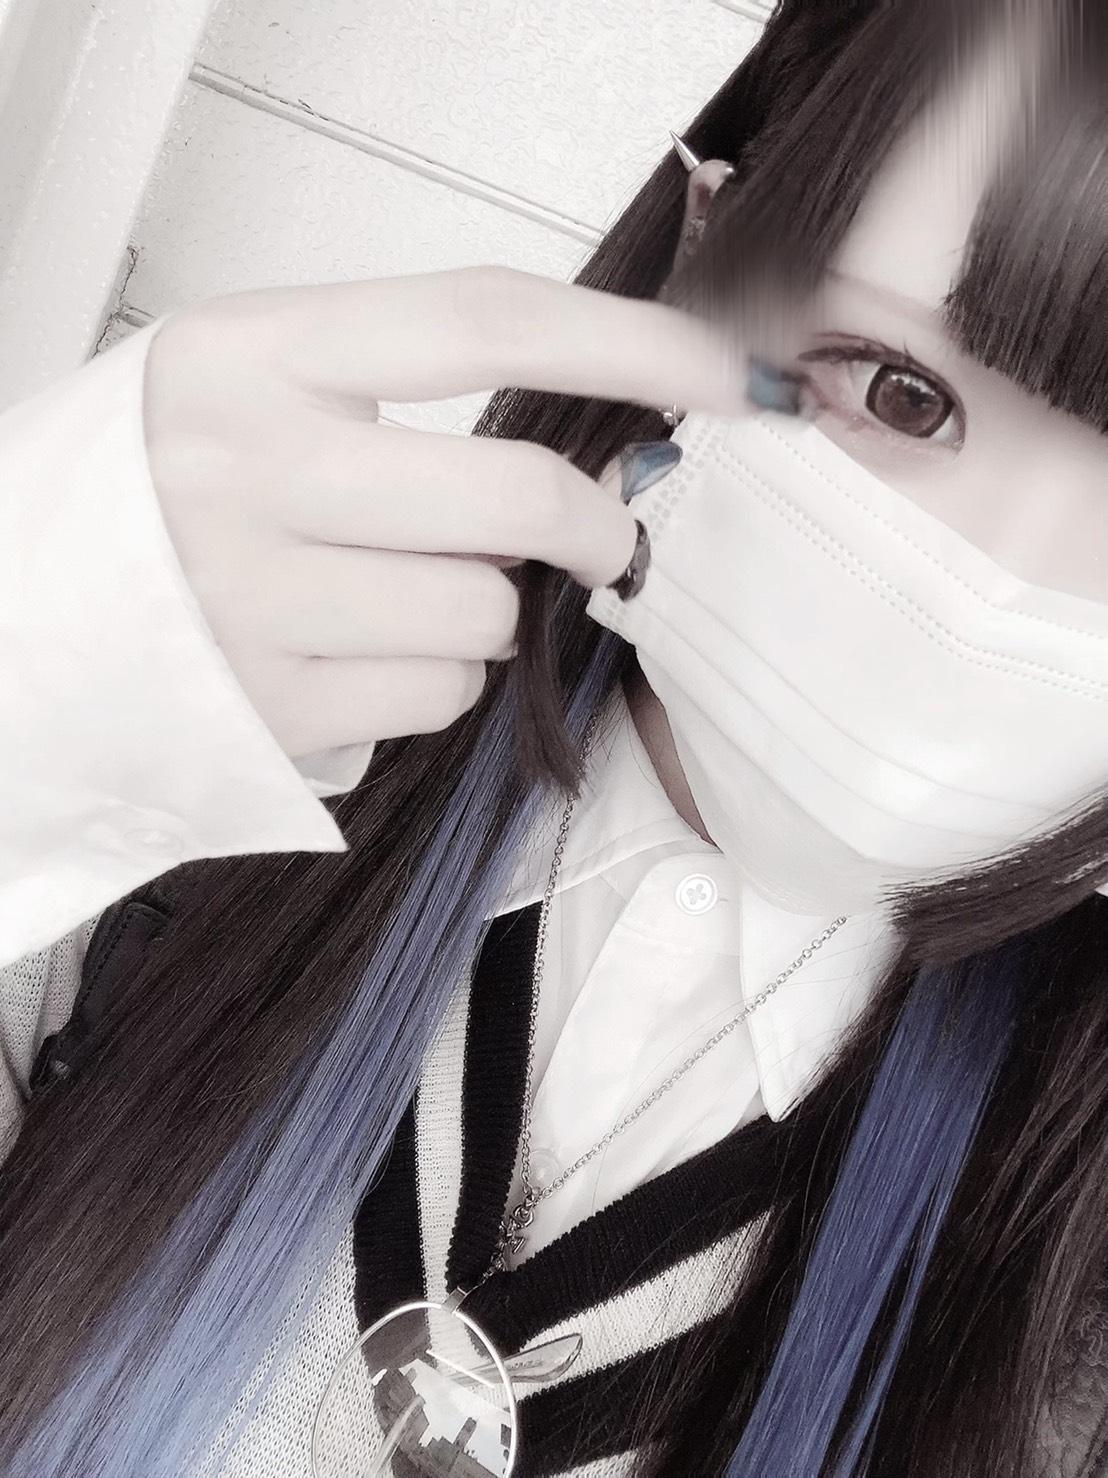 【JKリフレ東京】松下なほJK中退年齢18歳!完全未経験